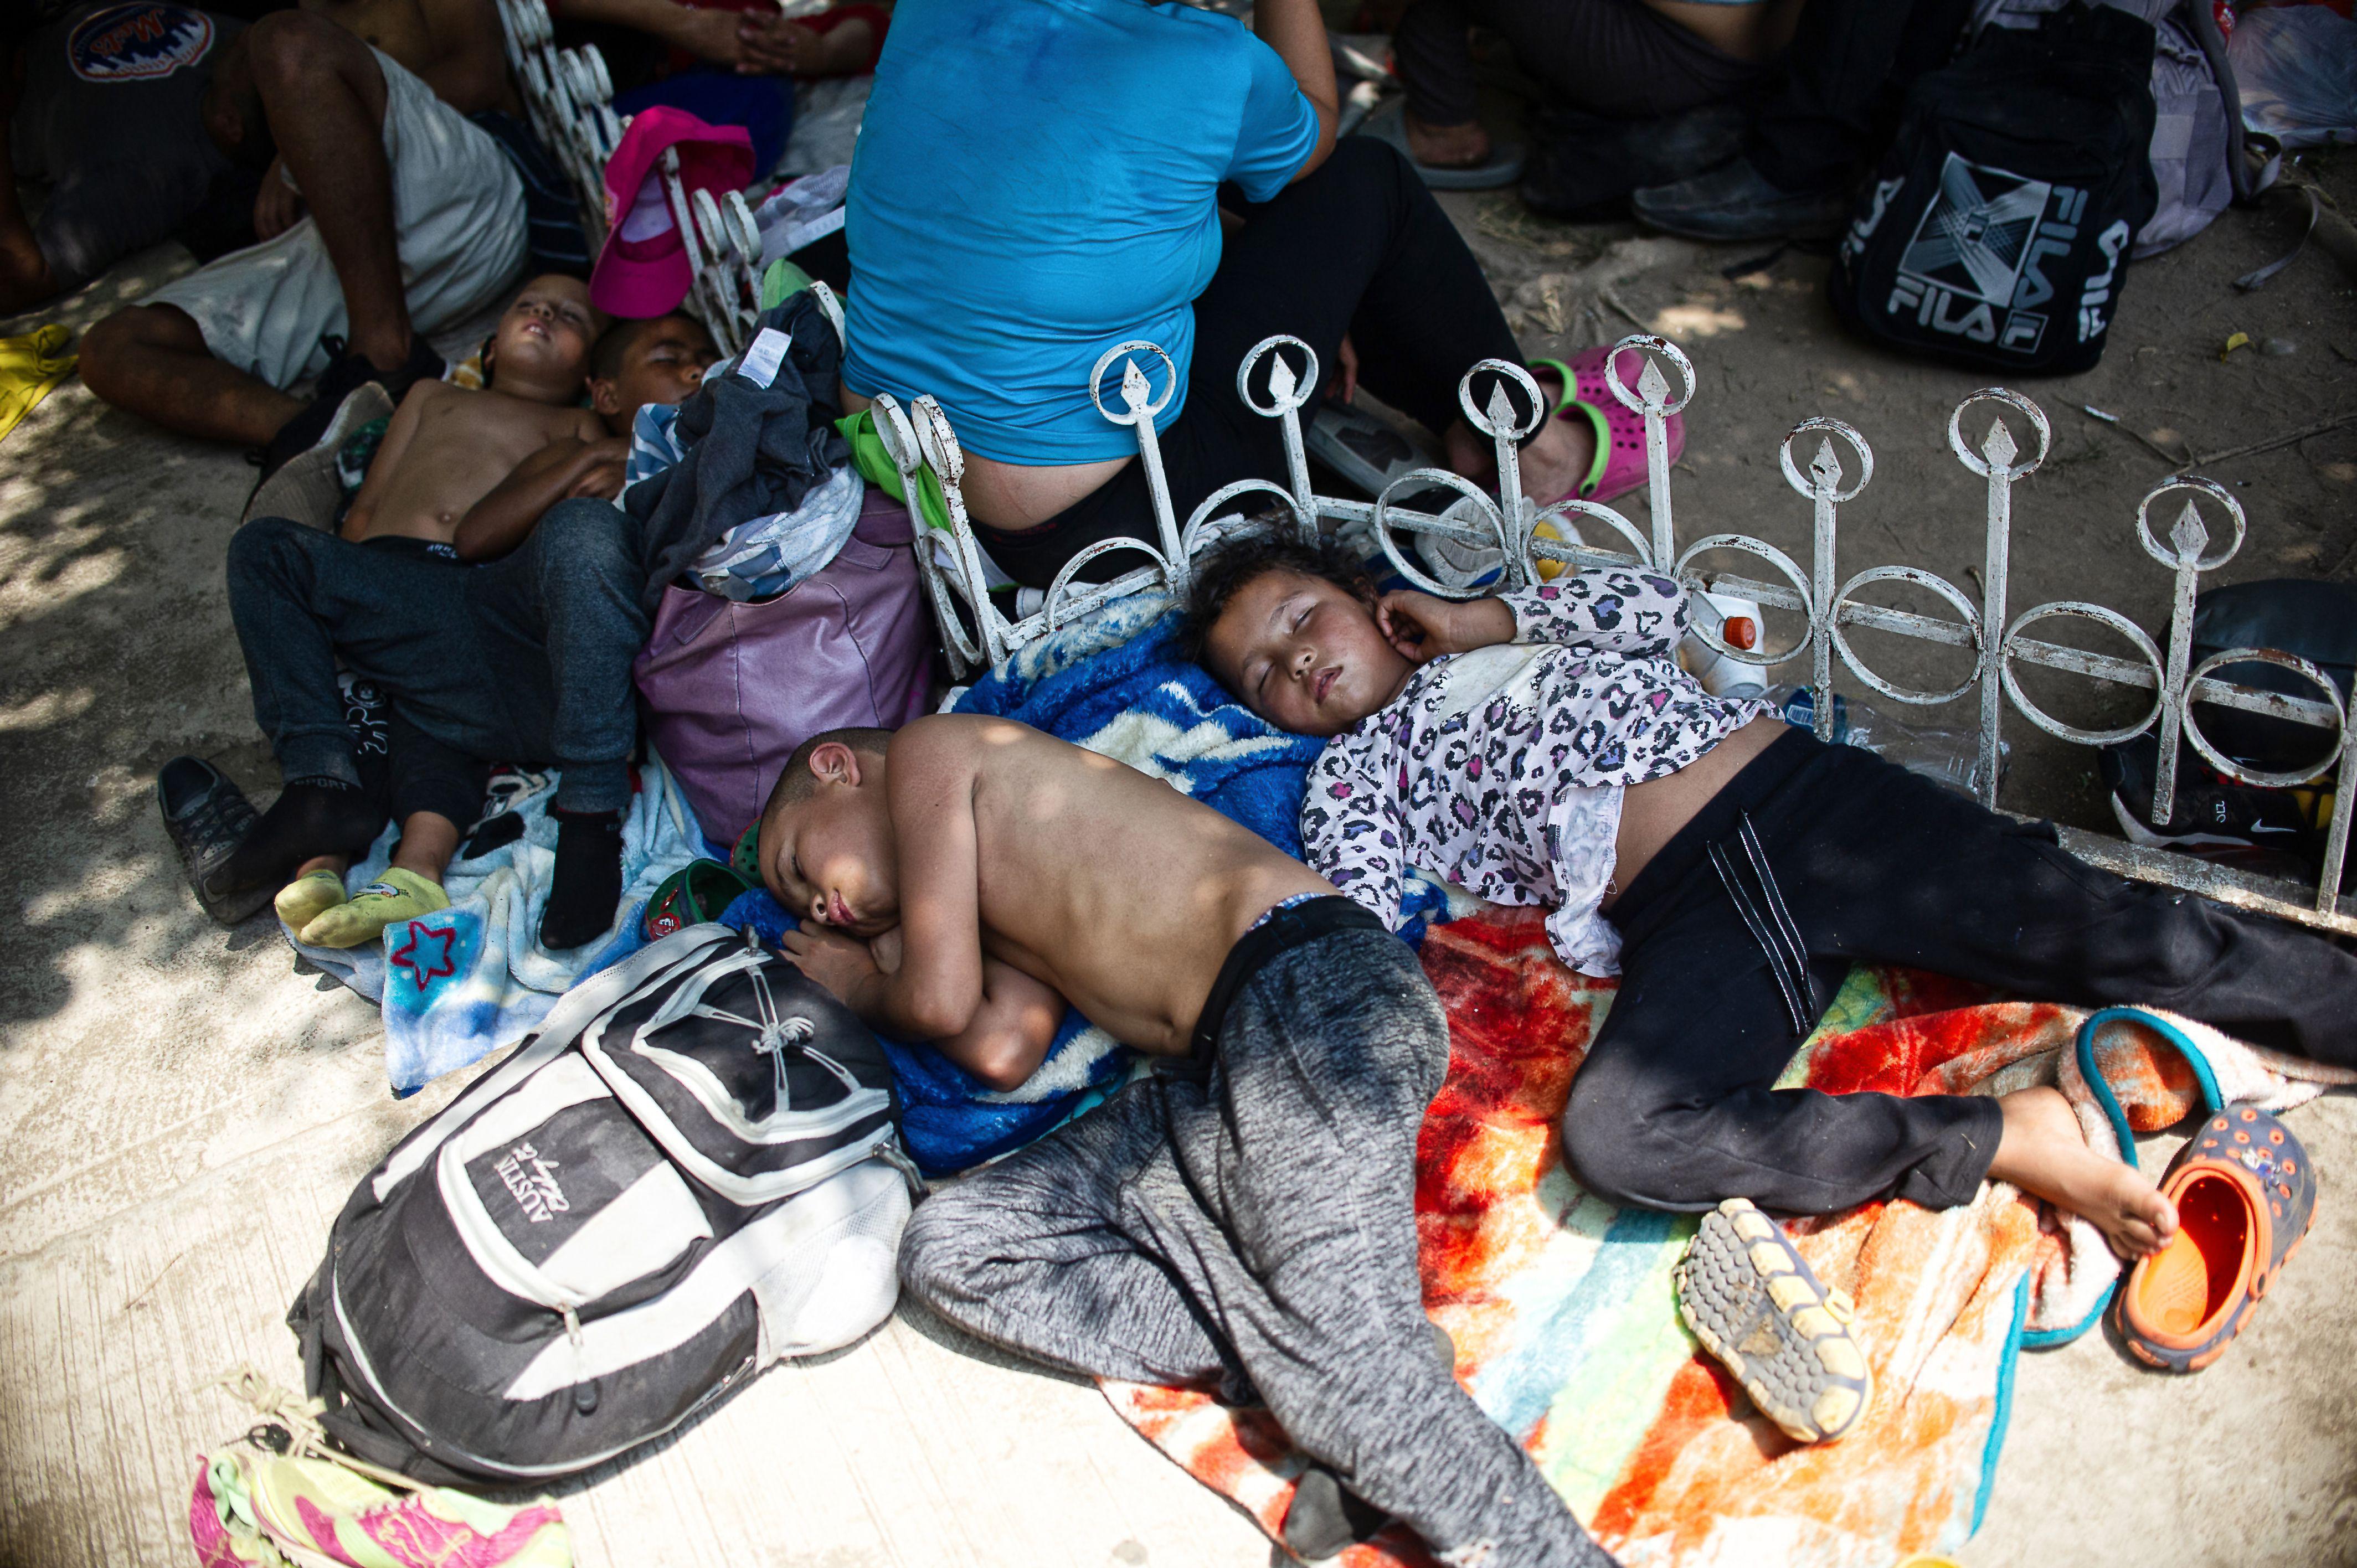 Central American migrant children en route to the U.S. border rest near Huehuetan, Chiapas state, Mexico, on April 15, 2019.